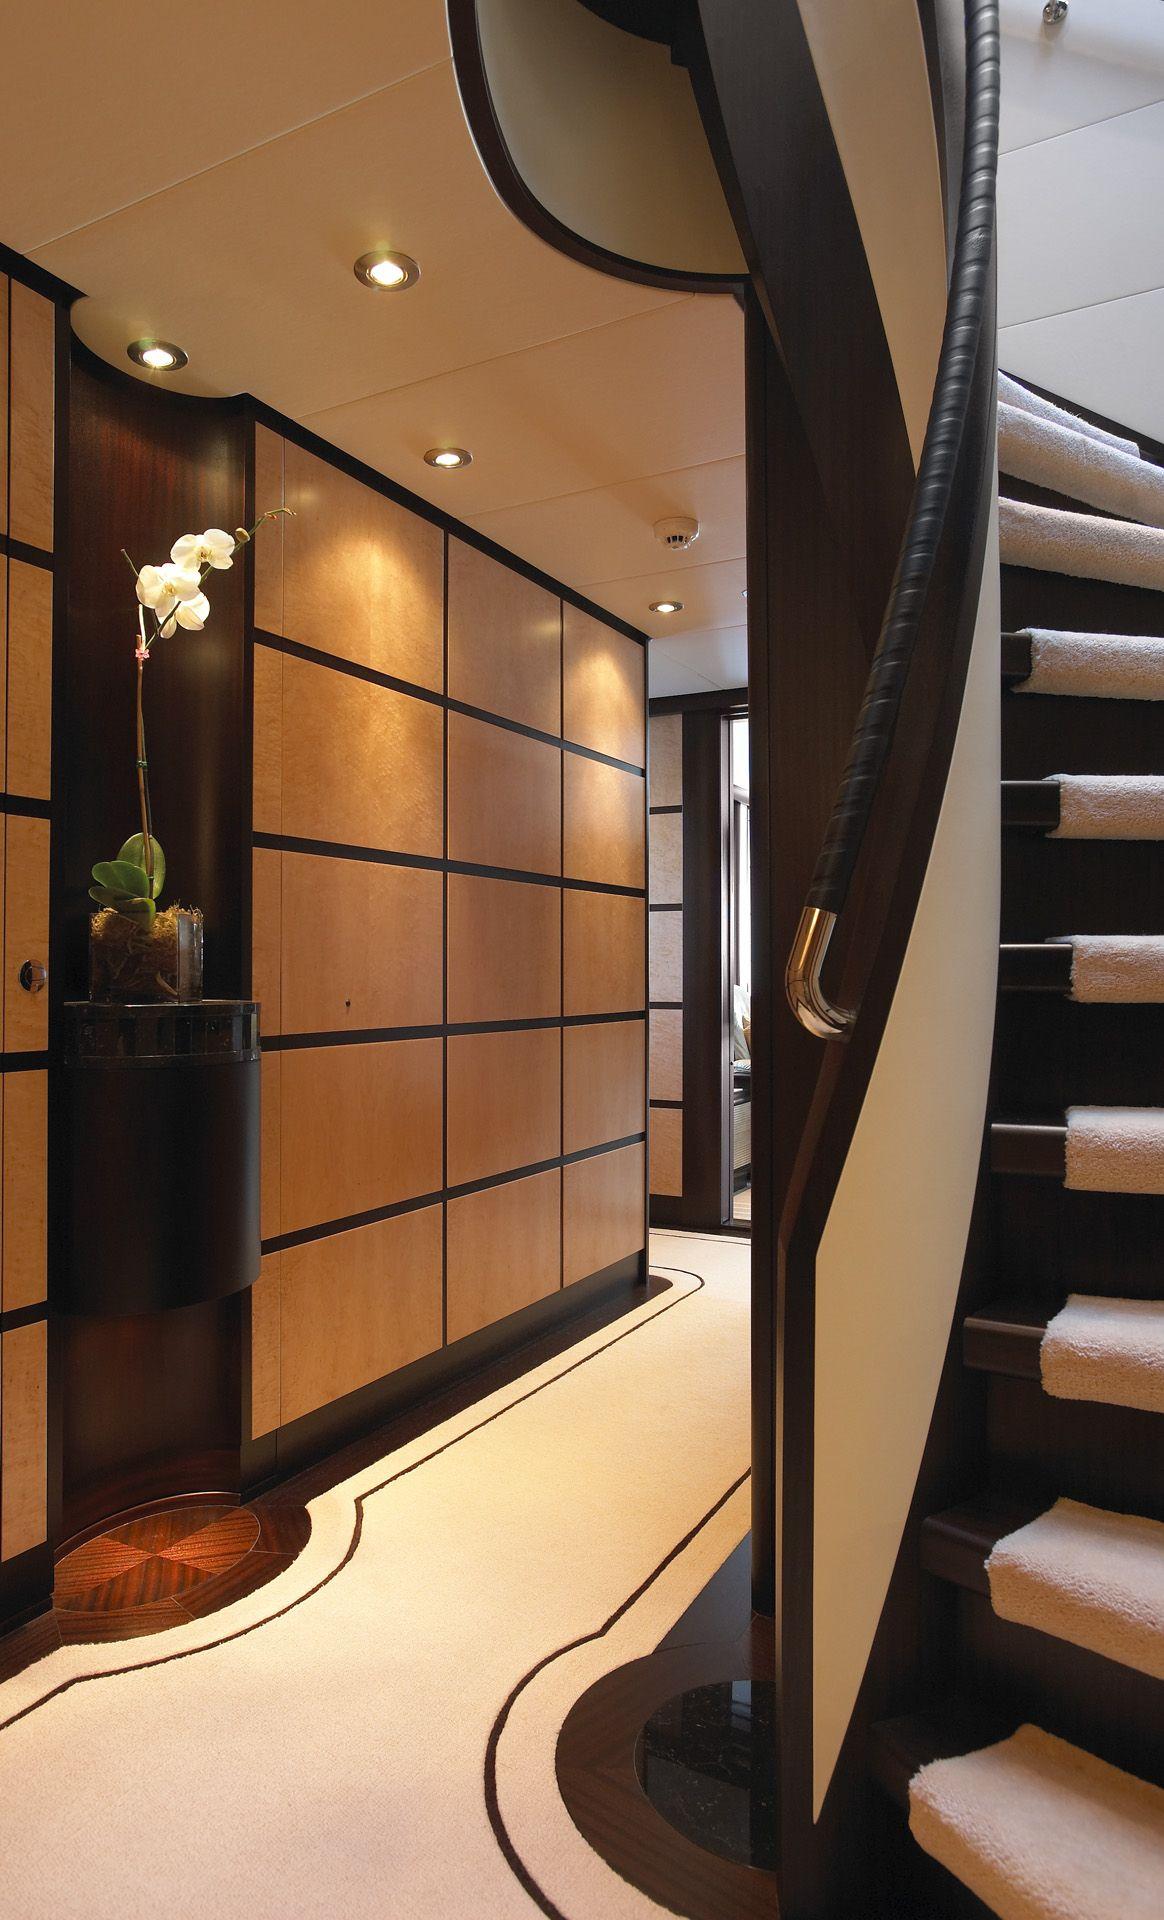 Best 2Nd Tier Interior Spa Hallway Idea Rather Have Different 400 x 300